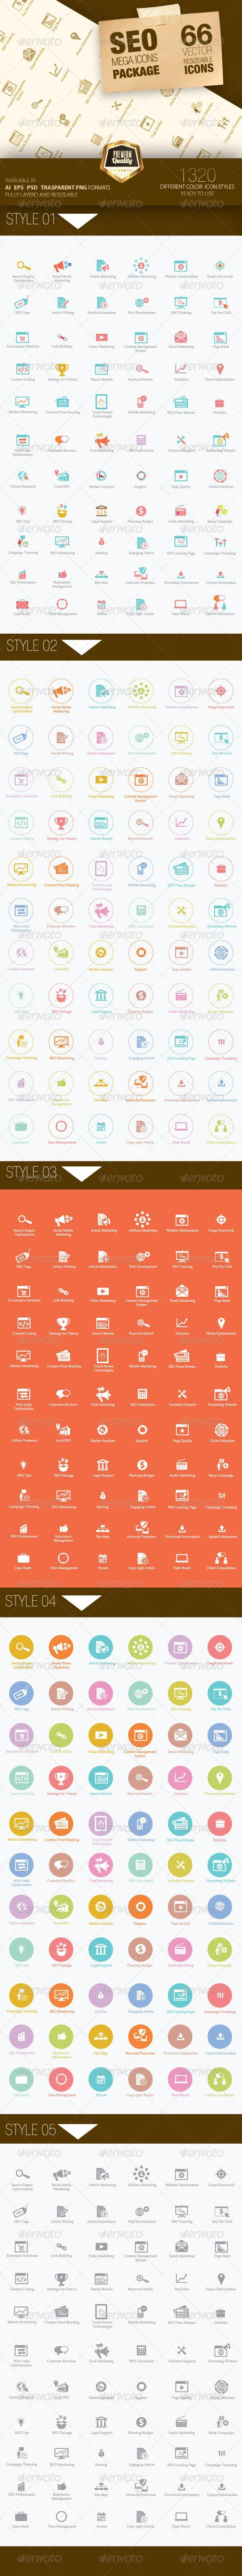 Seo Mega Icons Pack  #GraphicRiver           Creat...